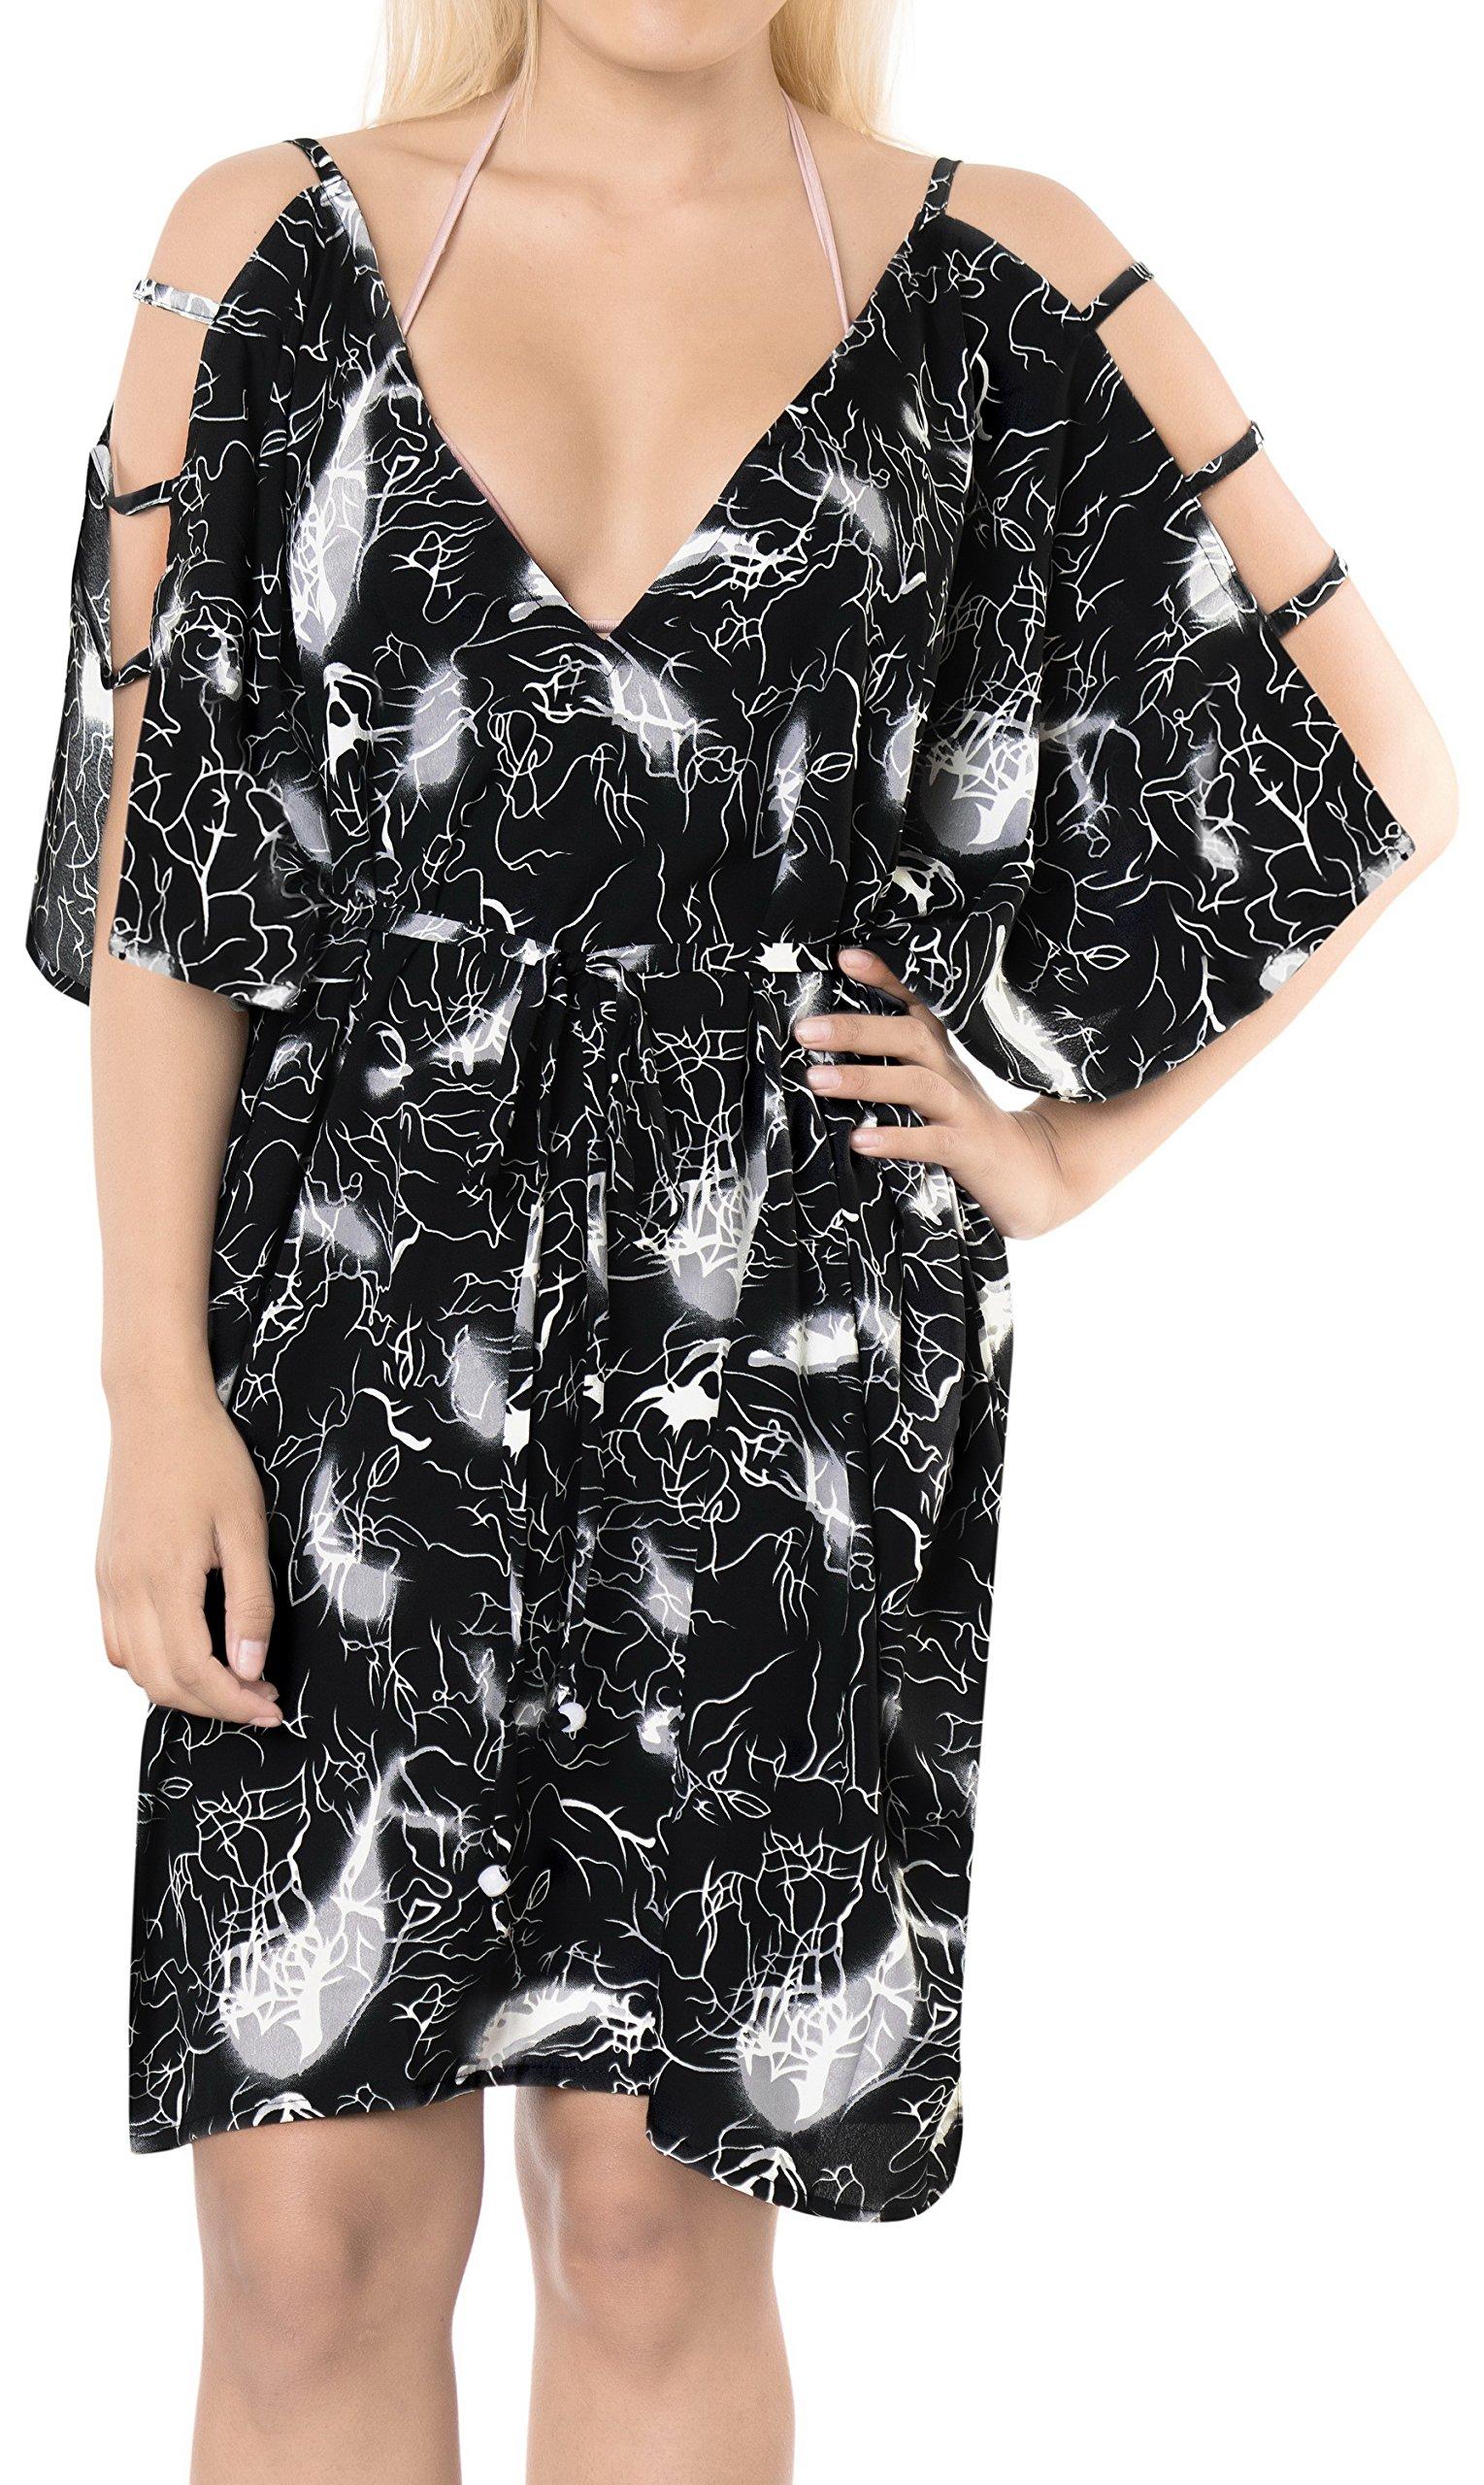 LA LEELA Soft fabric Printed Swimsuit Cover Up OSFM 16-20 [XL-2X] Black_6609 by LA LEELA (Image #1)